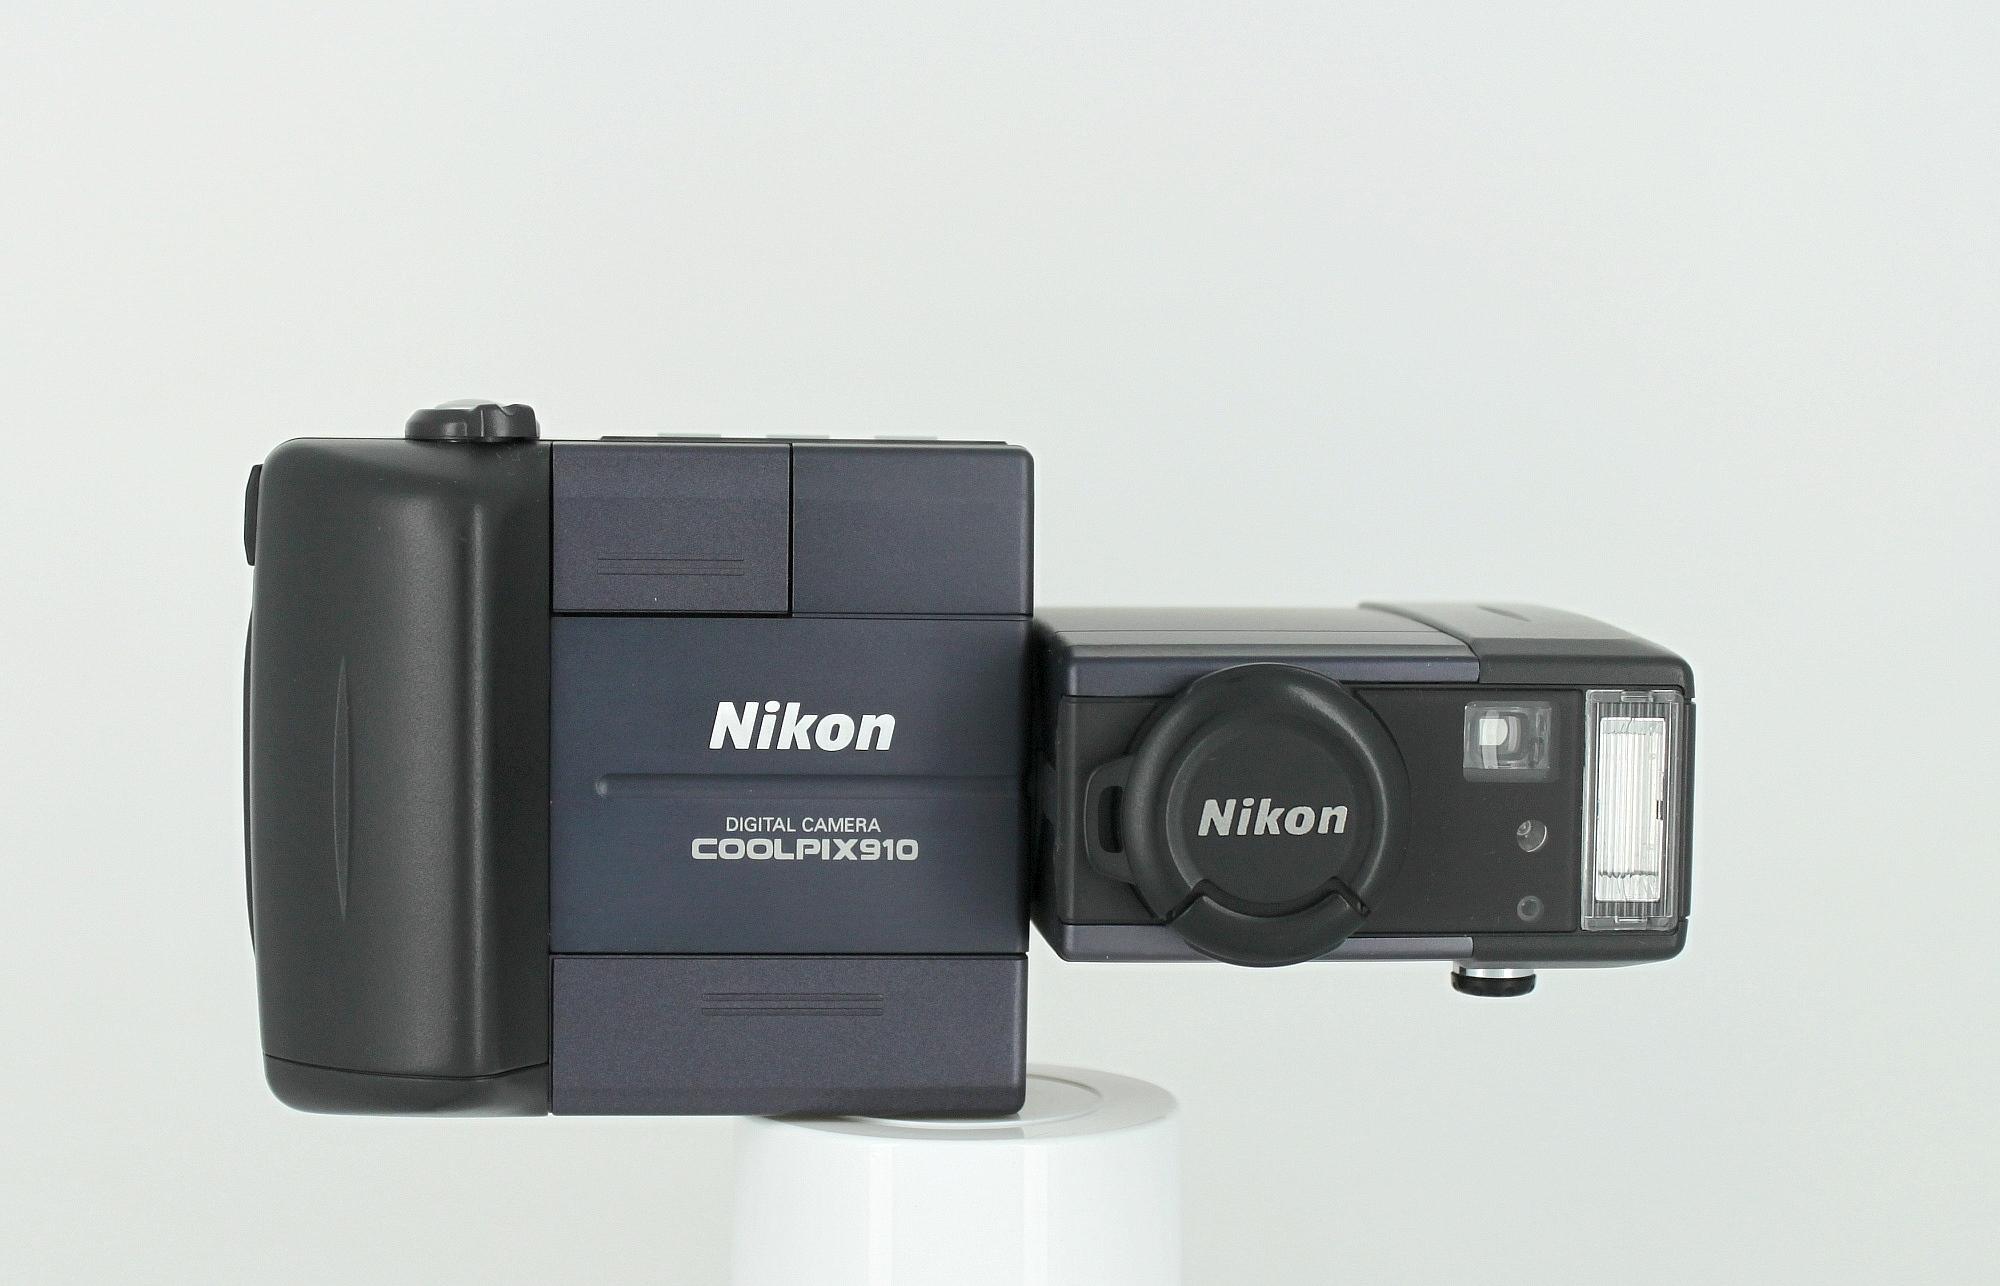 Nikon CoolPix 910 (1998)